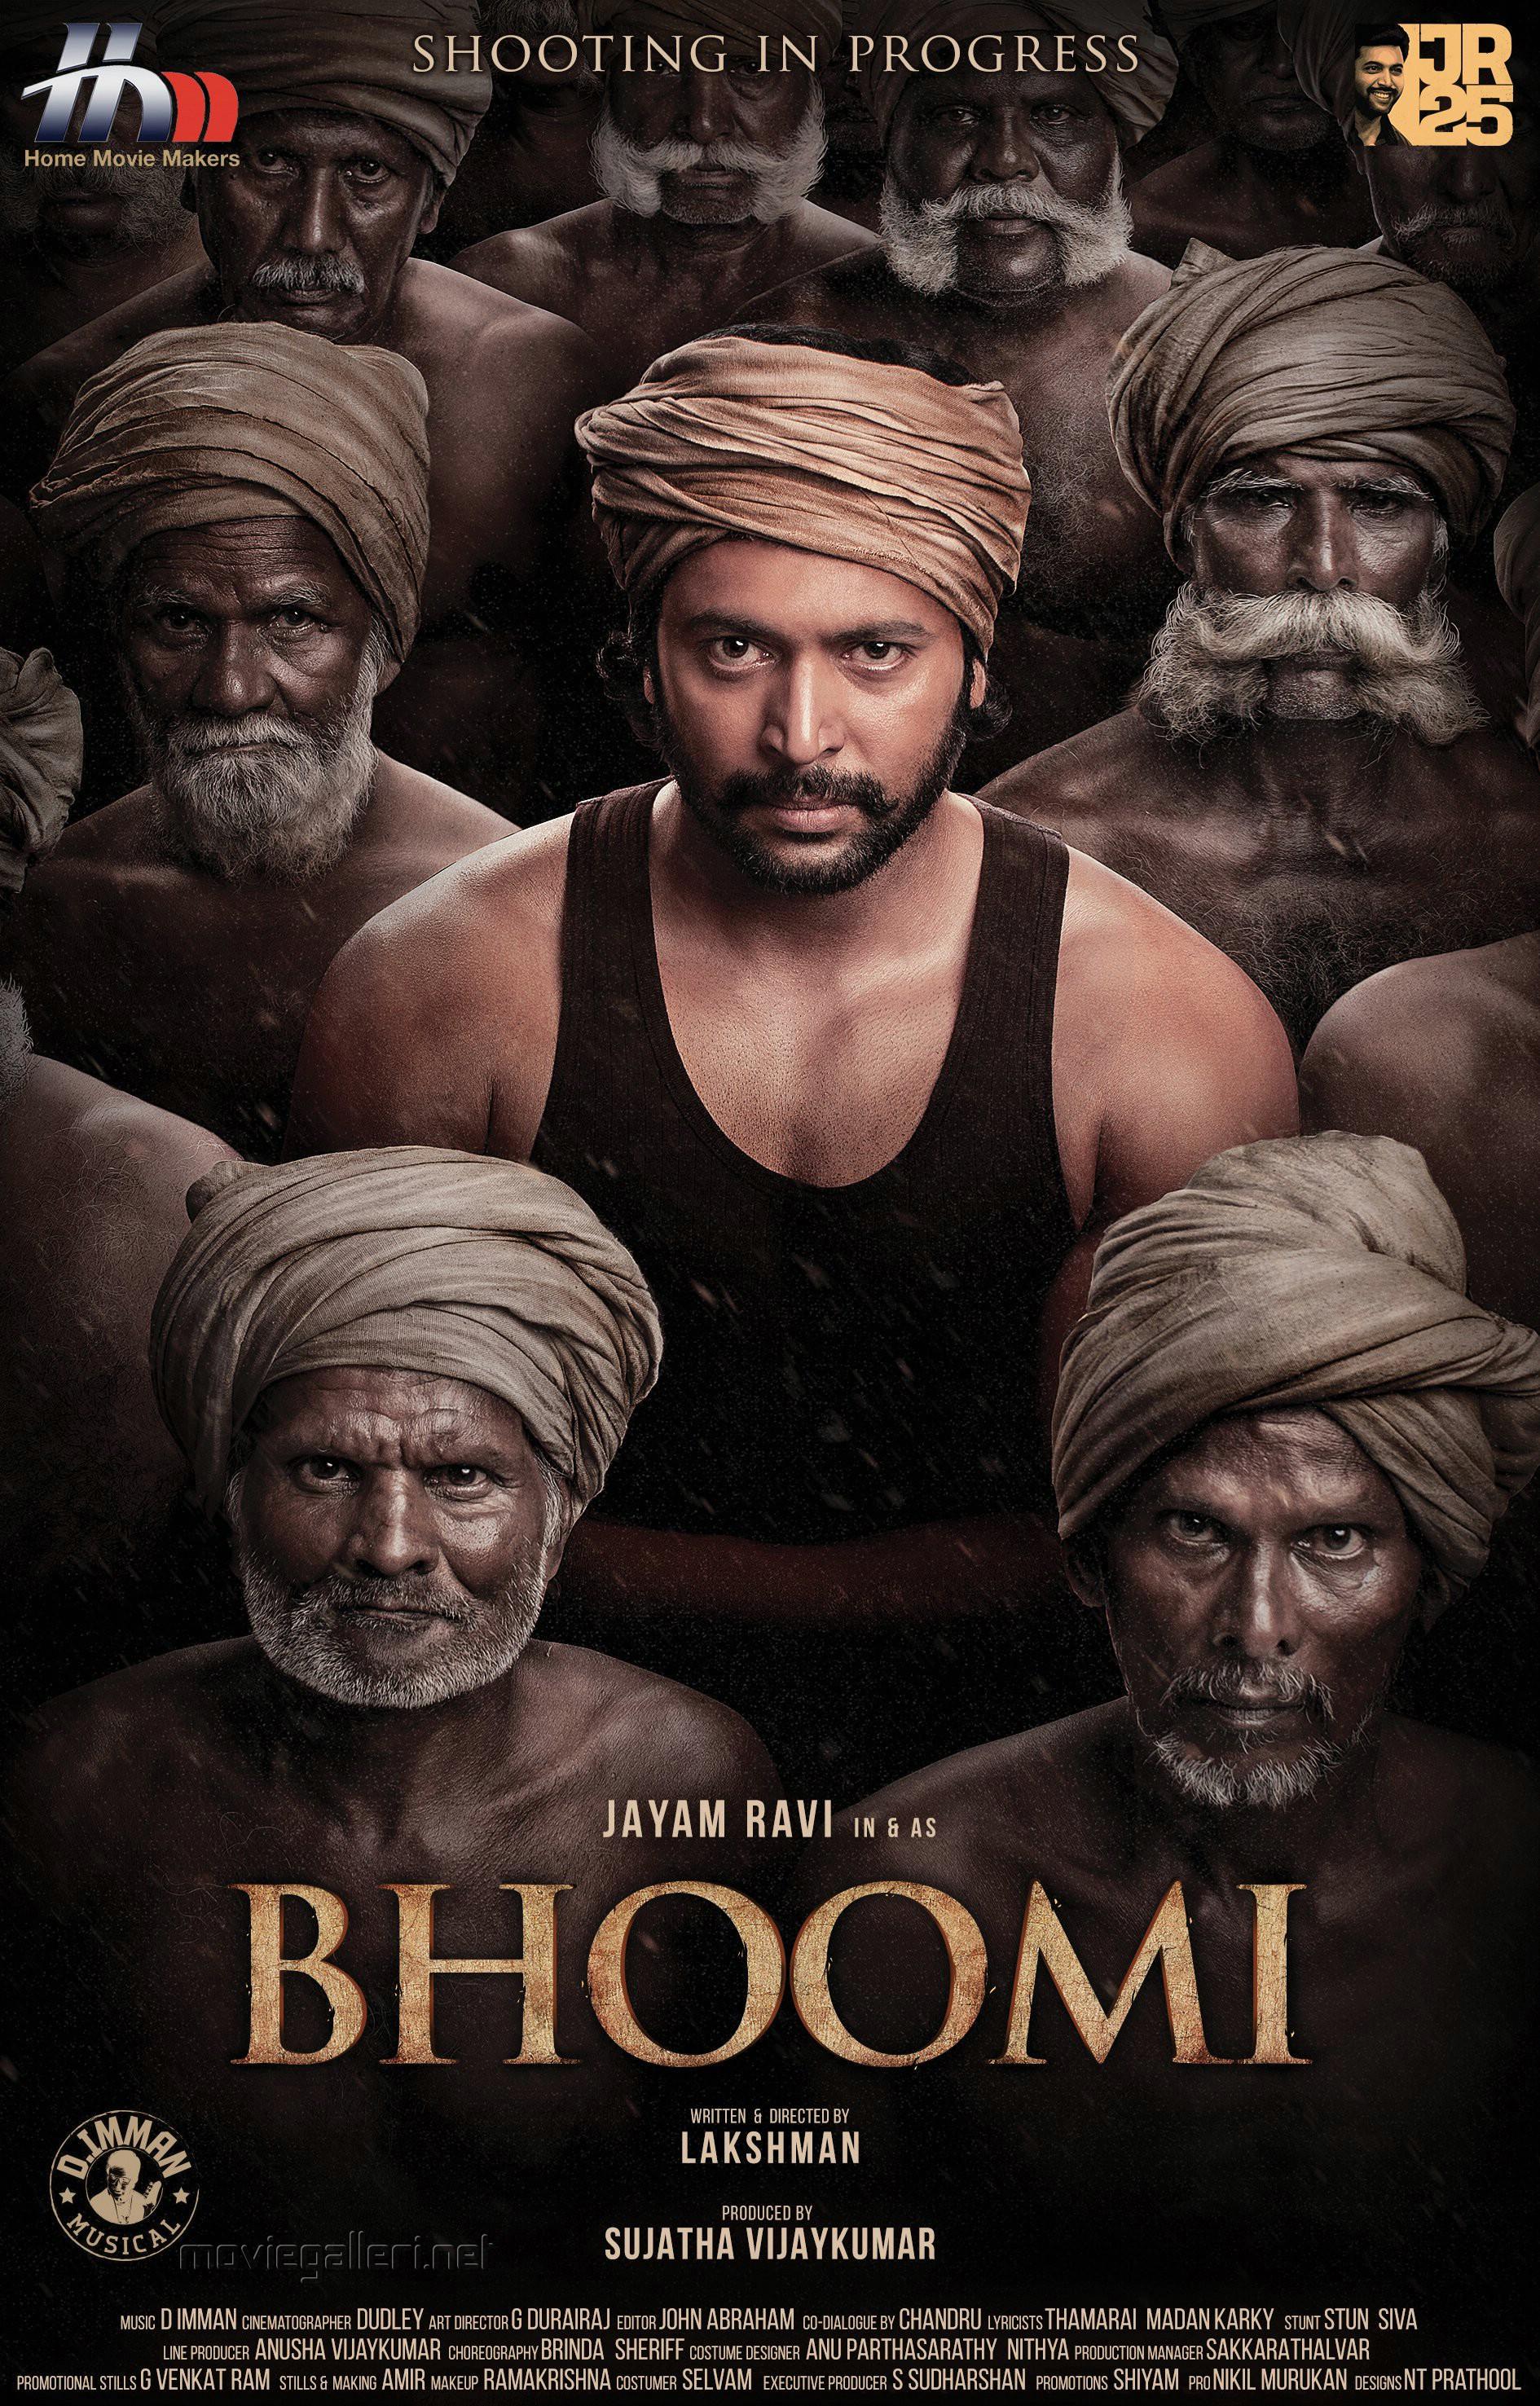 Jayam Ravi Bhoomi Movie First Look Poster HD